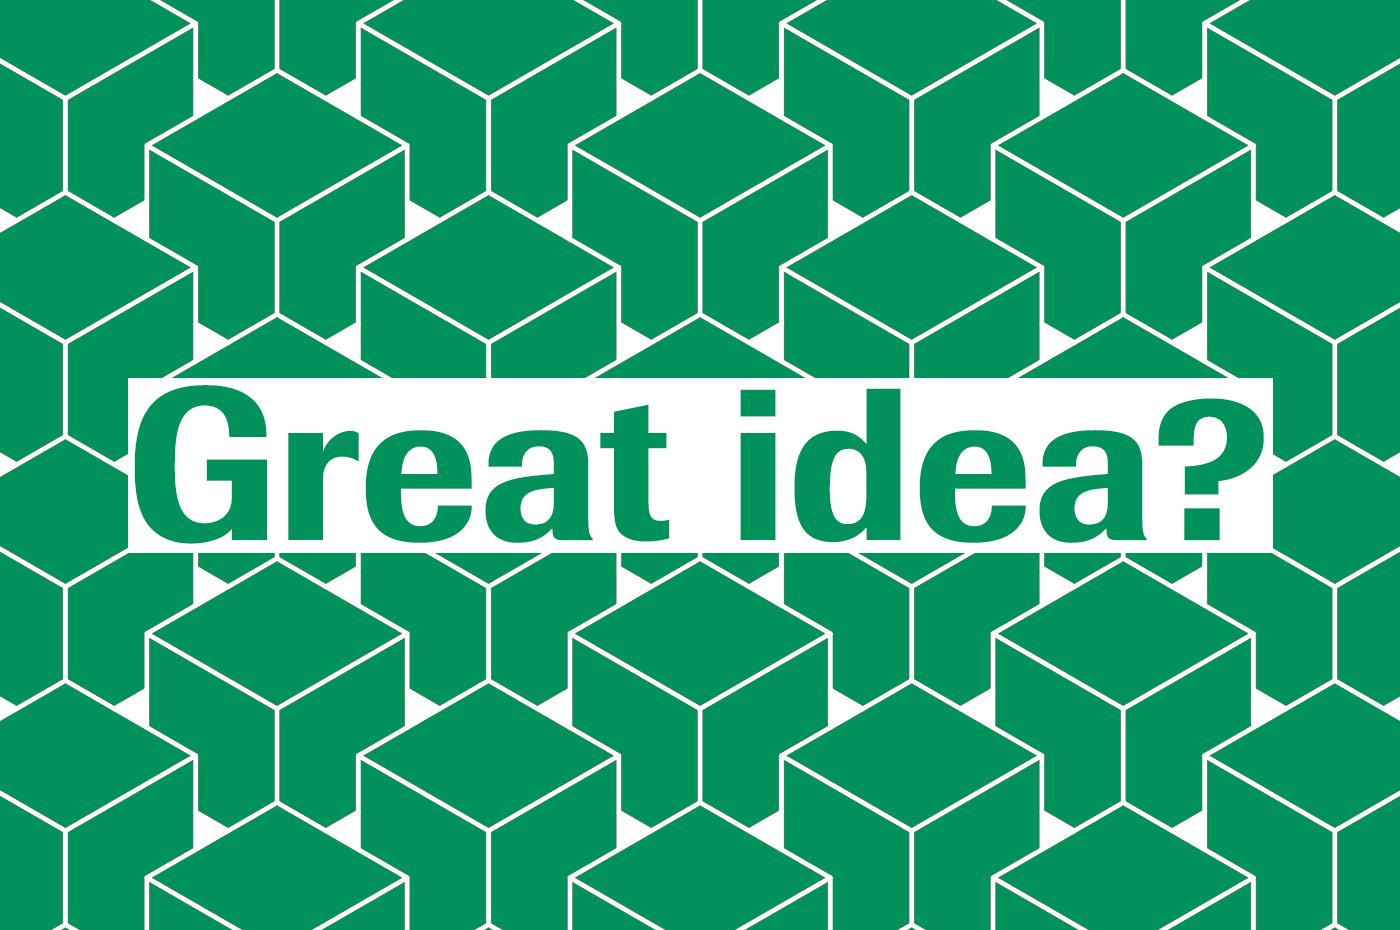 Greenfield Challenge